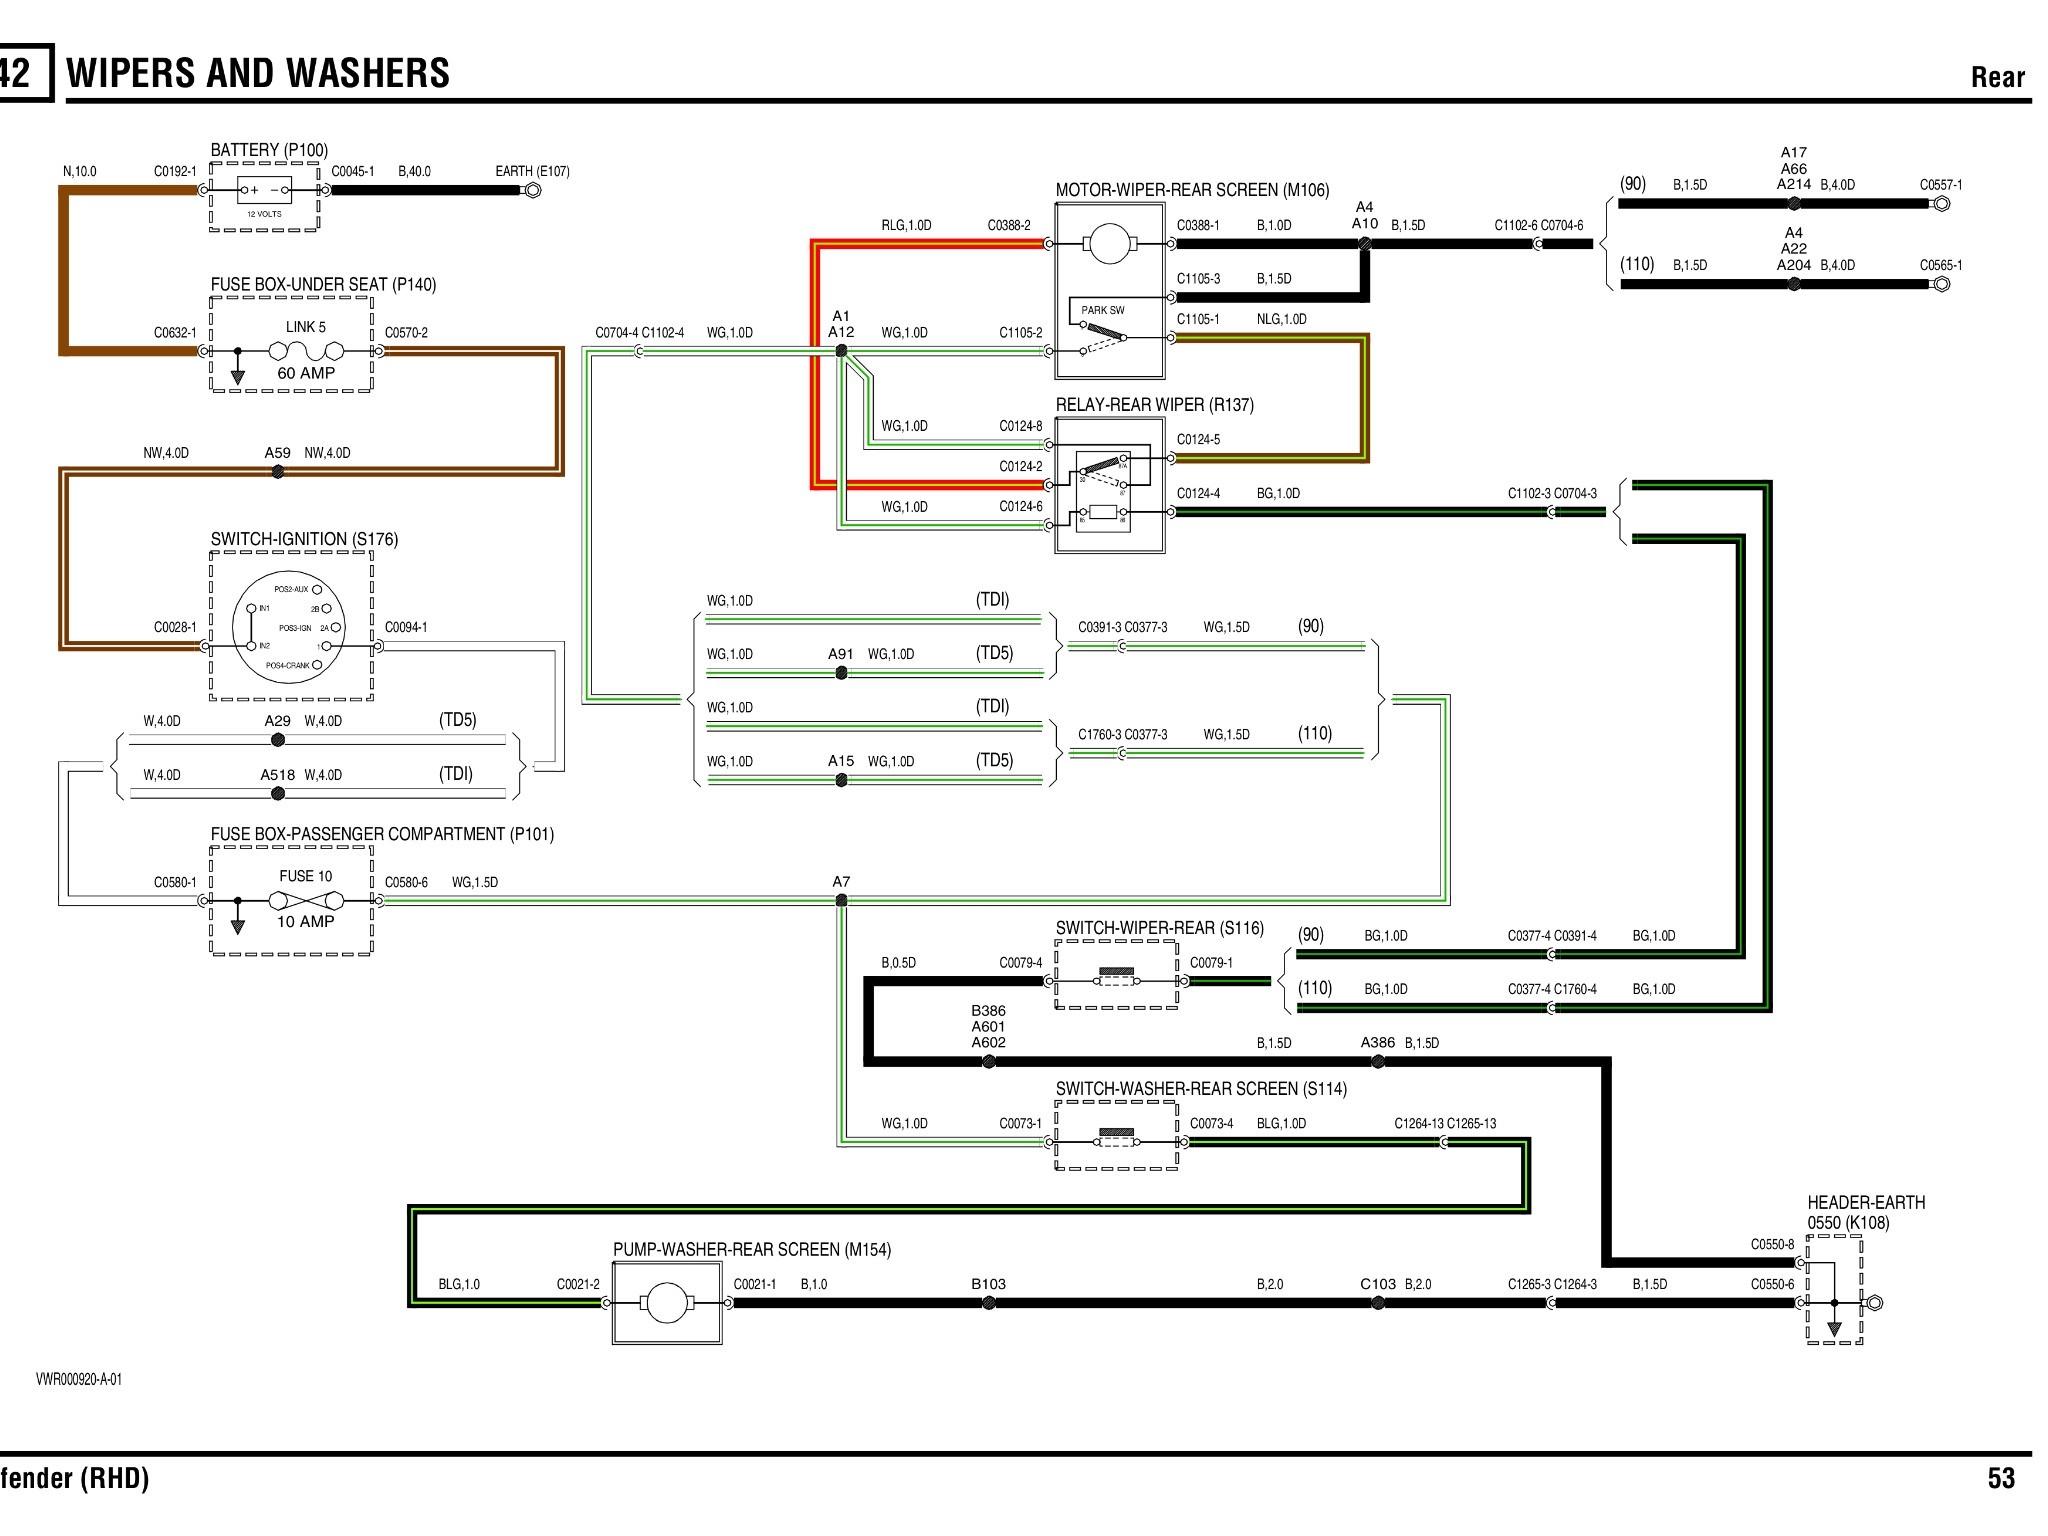 Sony Xplod Car Stereo Wiring Diagram Further Sony Xplod Wiring